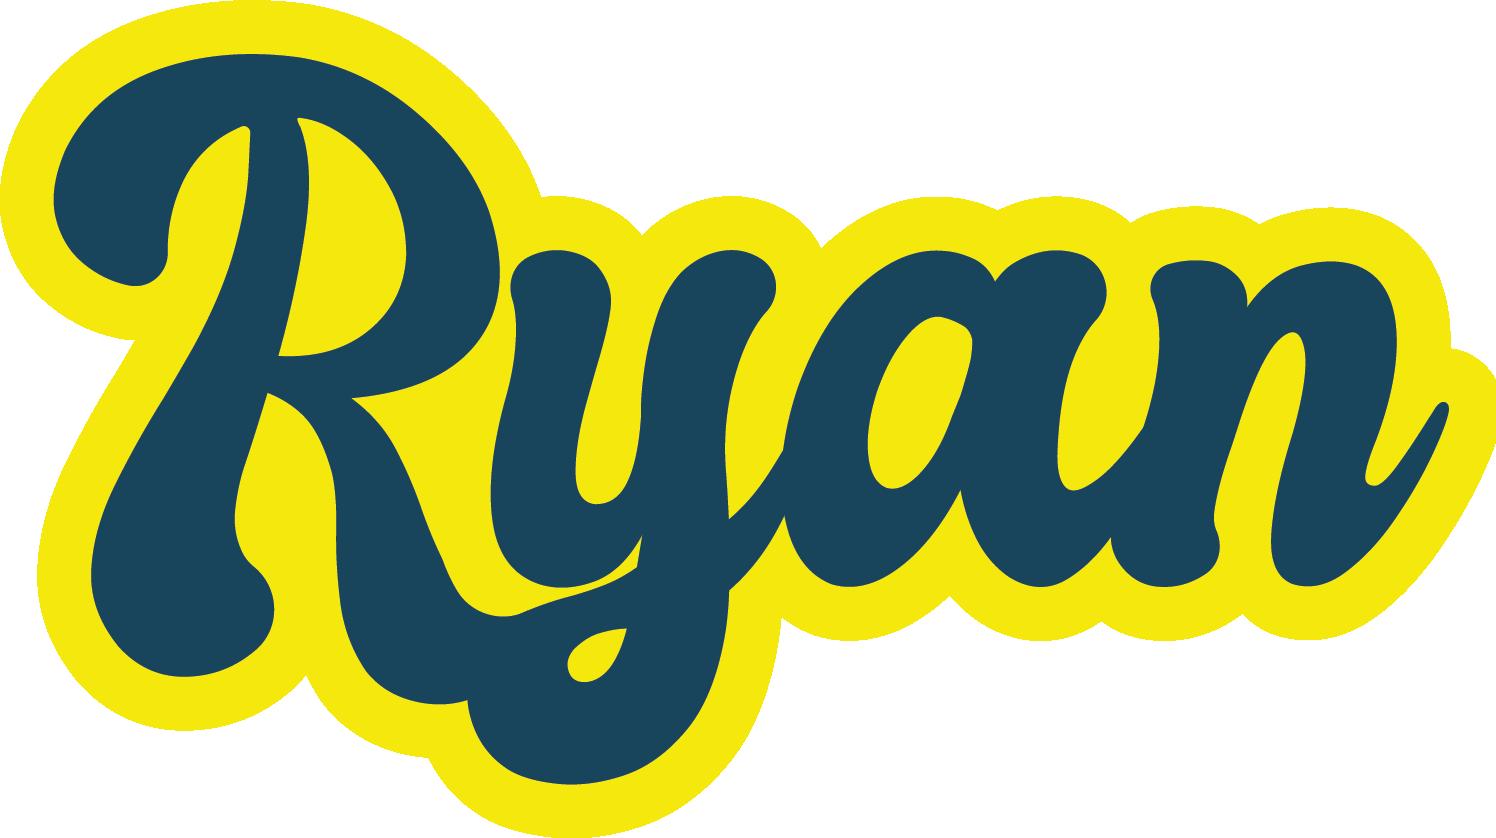 Ryan Abrams